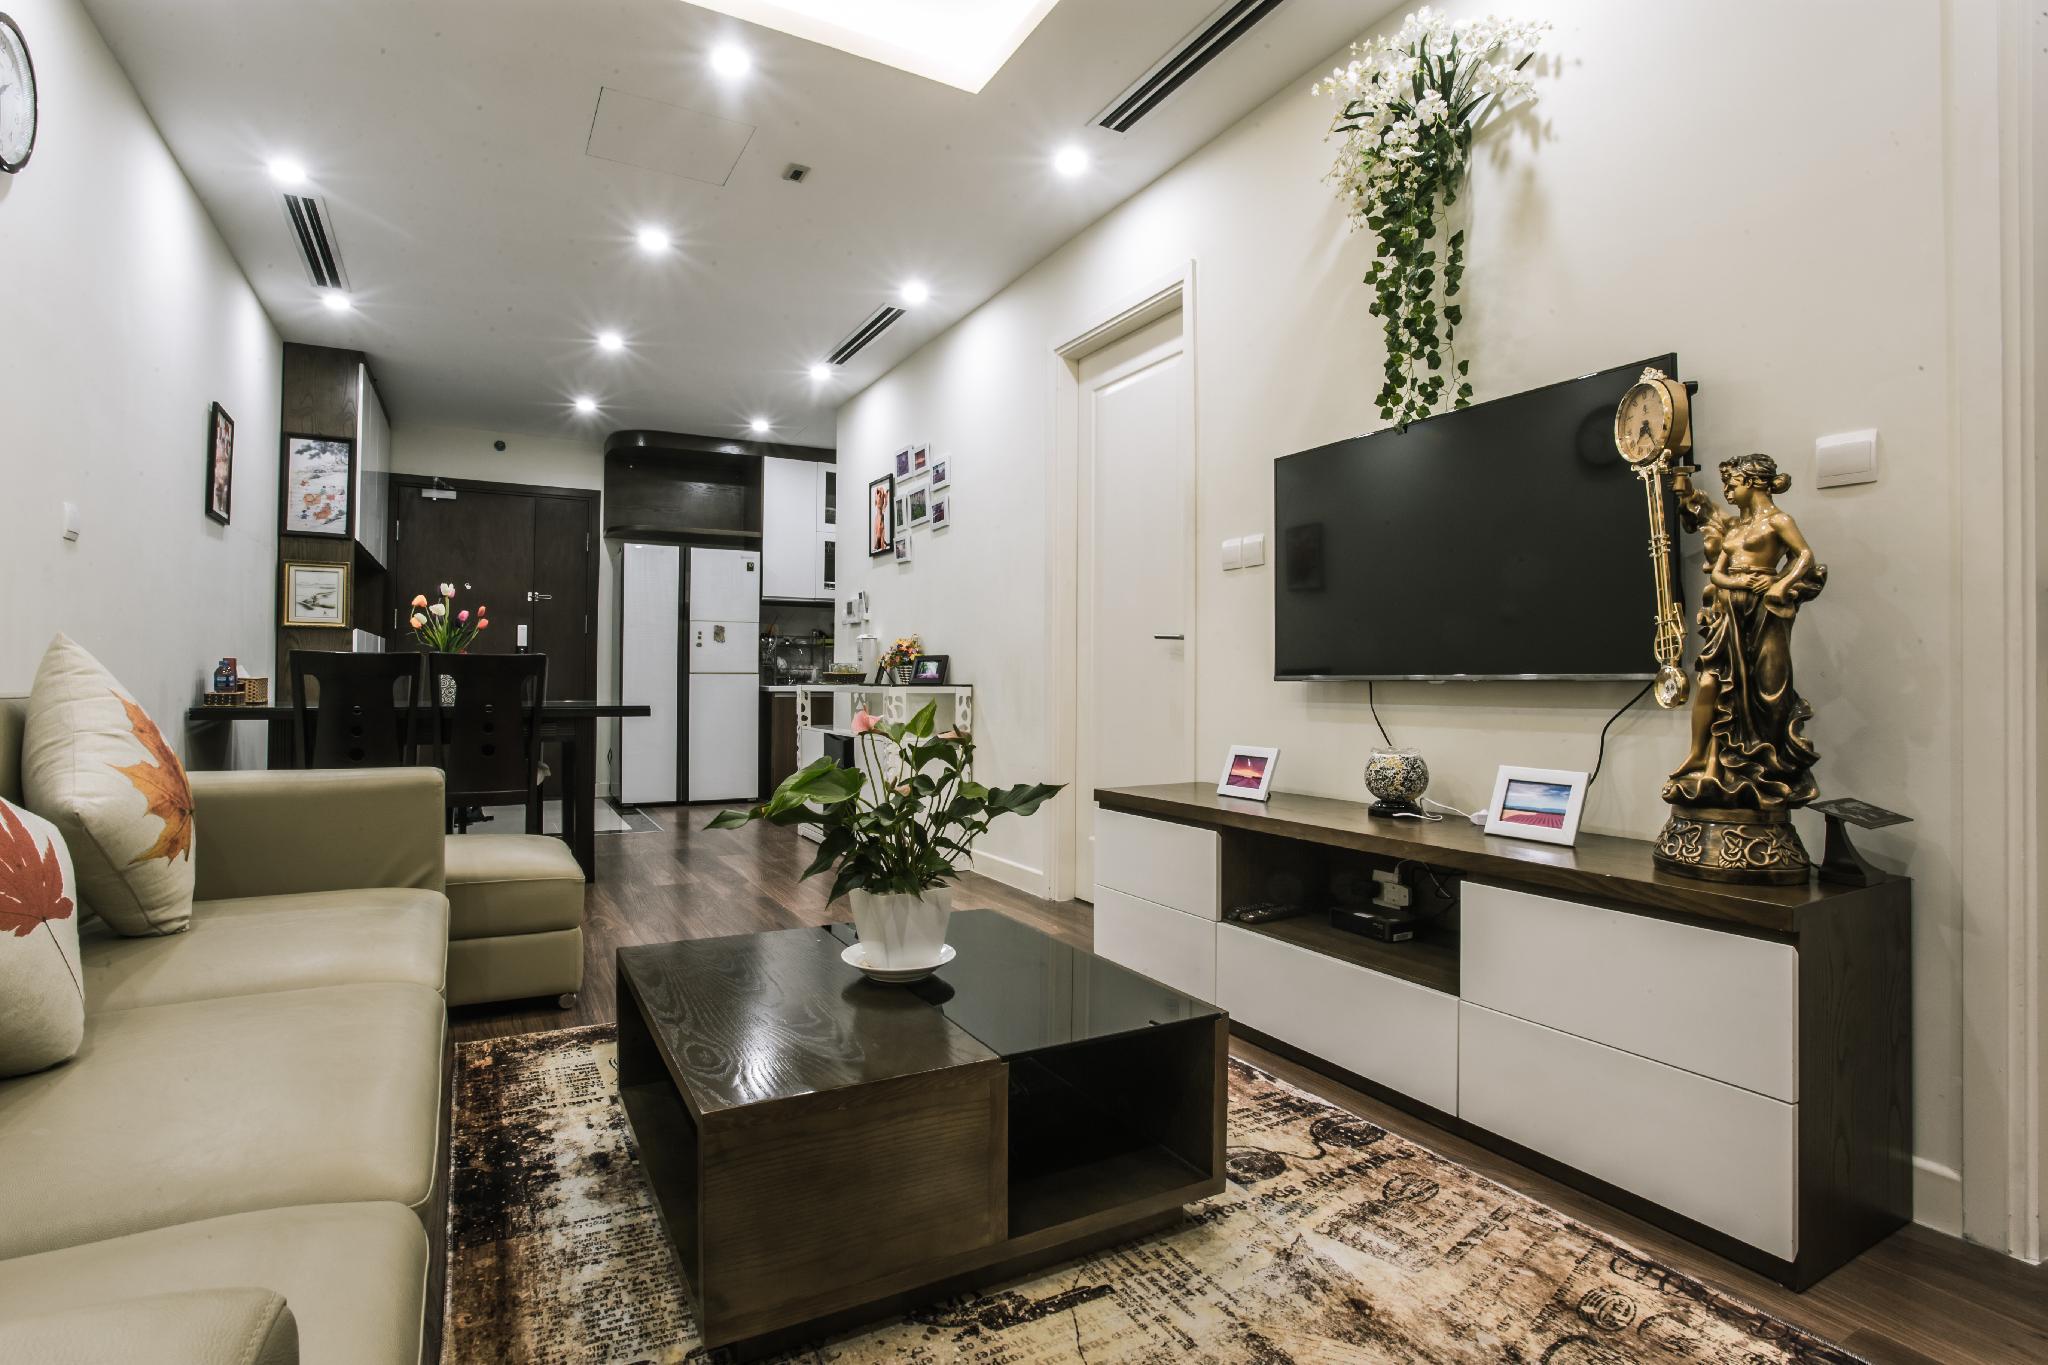 VISTAY004 Apartment 2BR At IMPERIA Cozy   Elegant